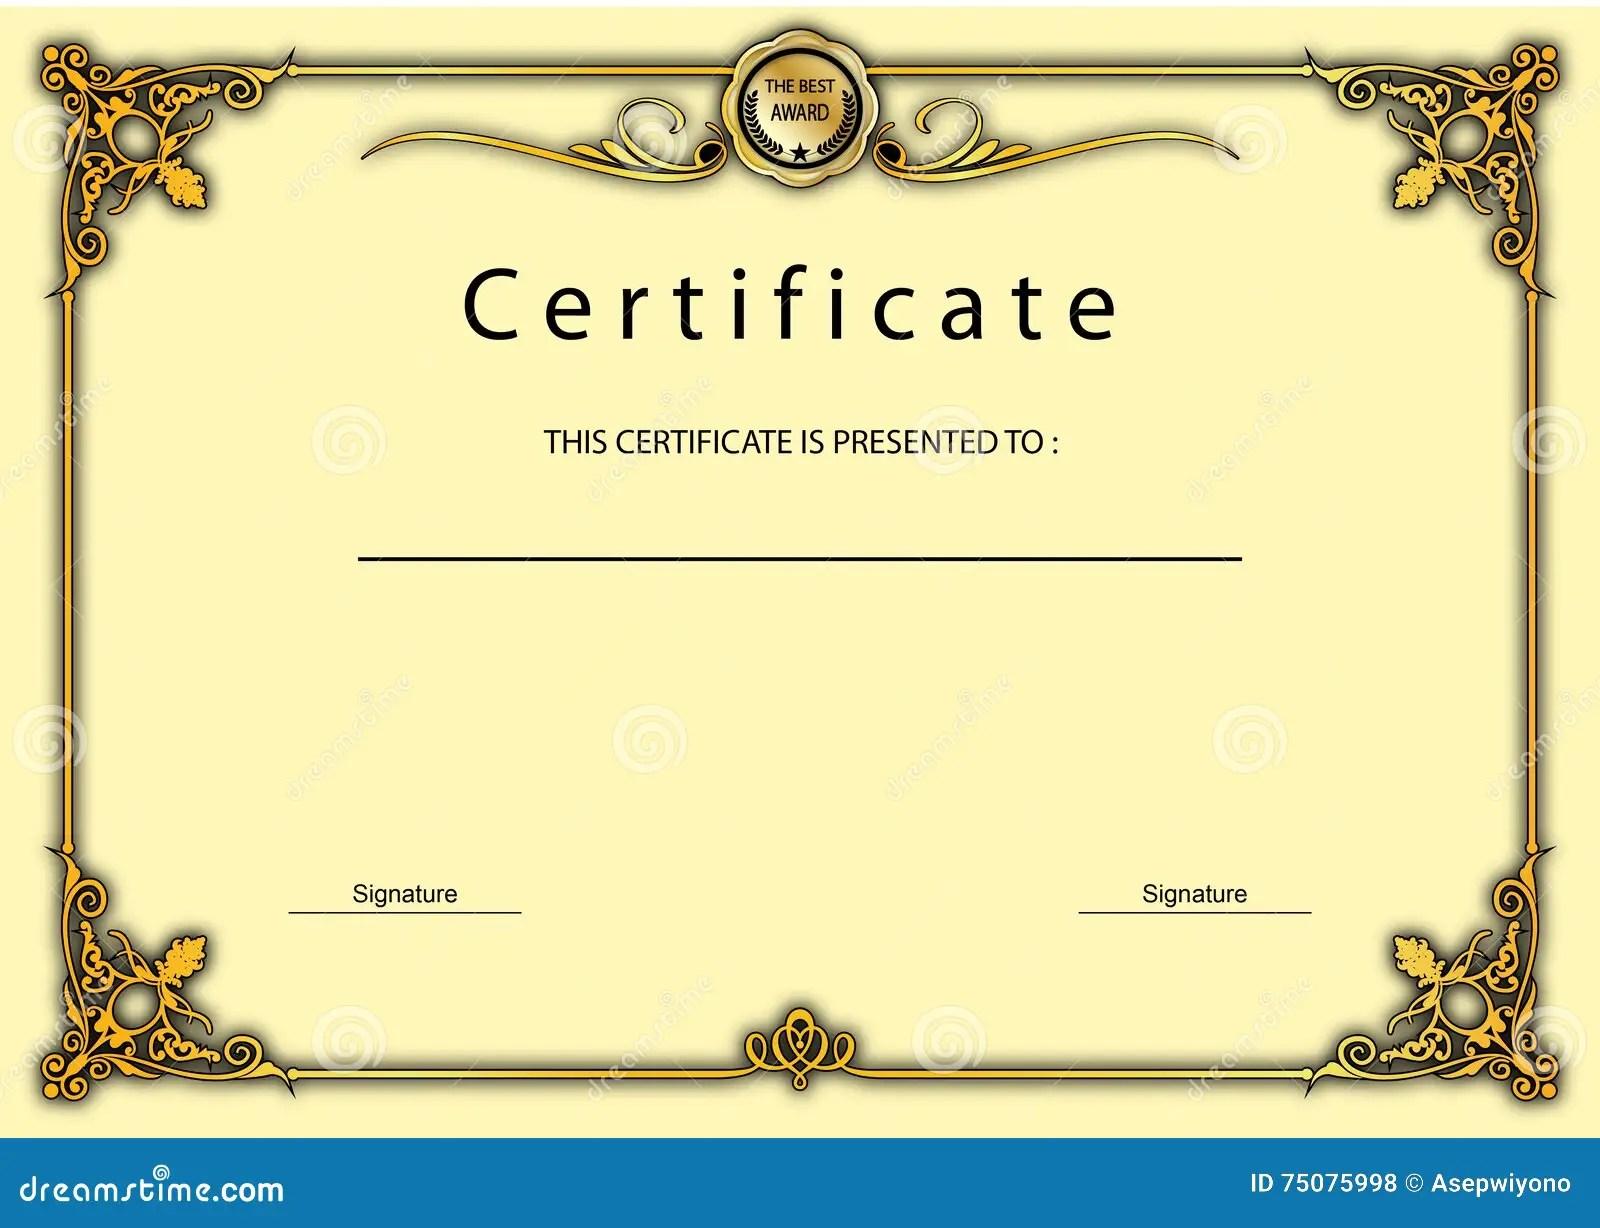 Certificate Of Appreciation Border Design Choice Image